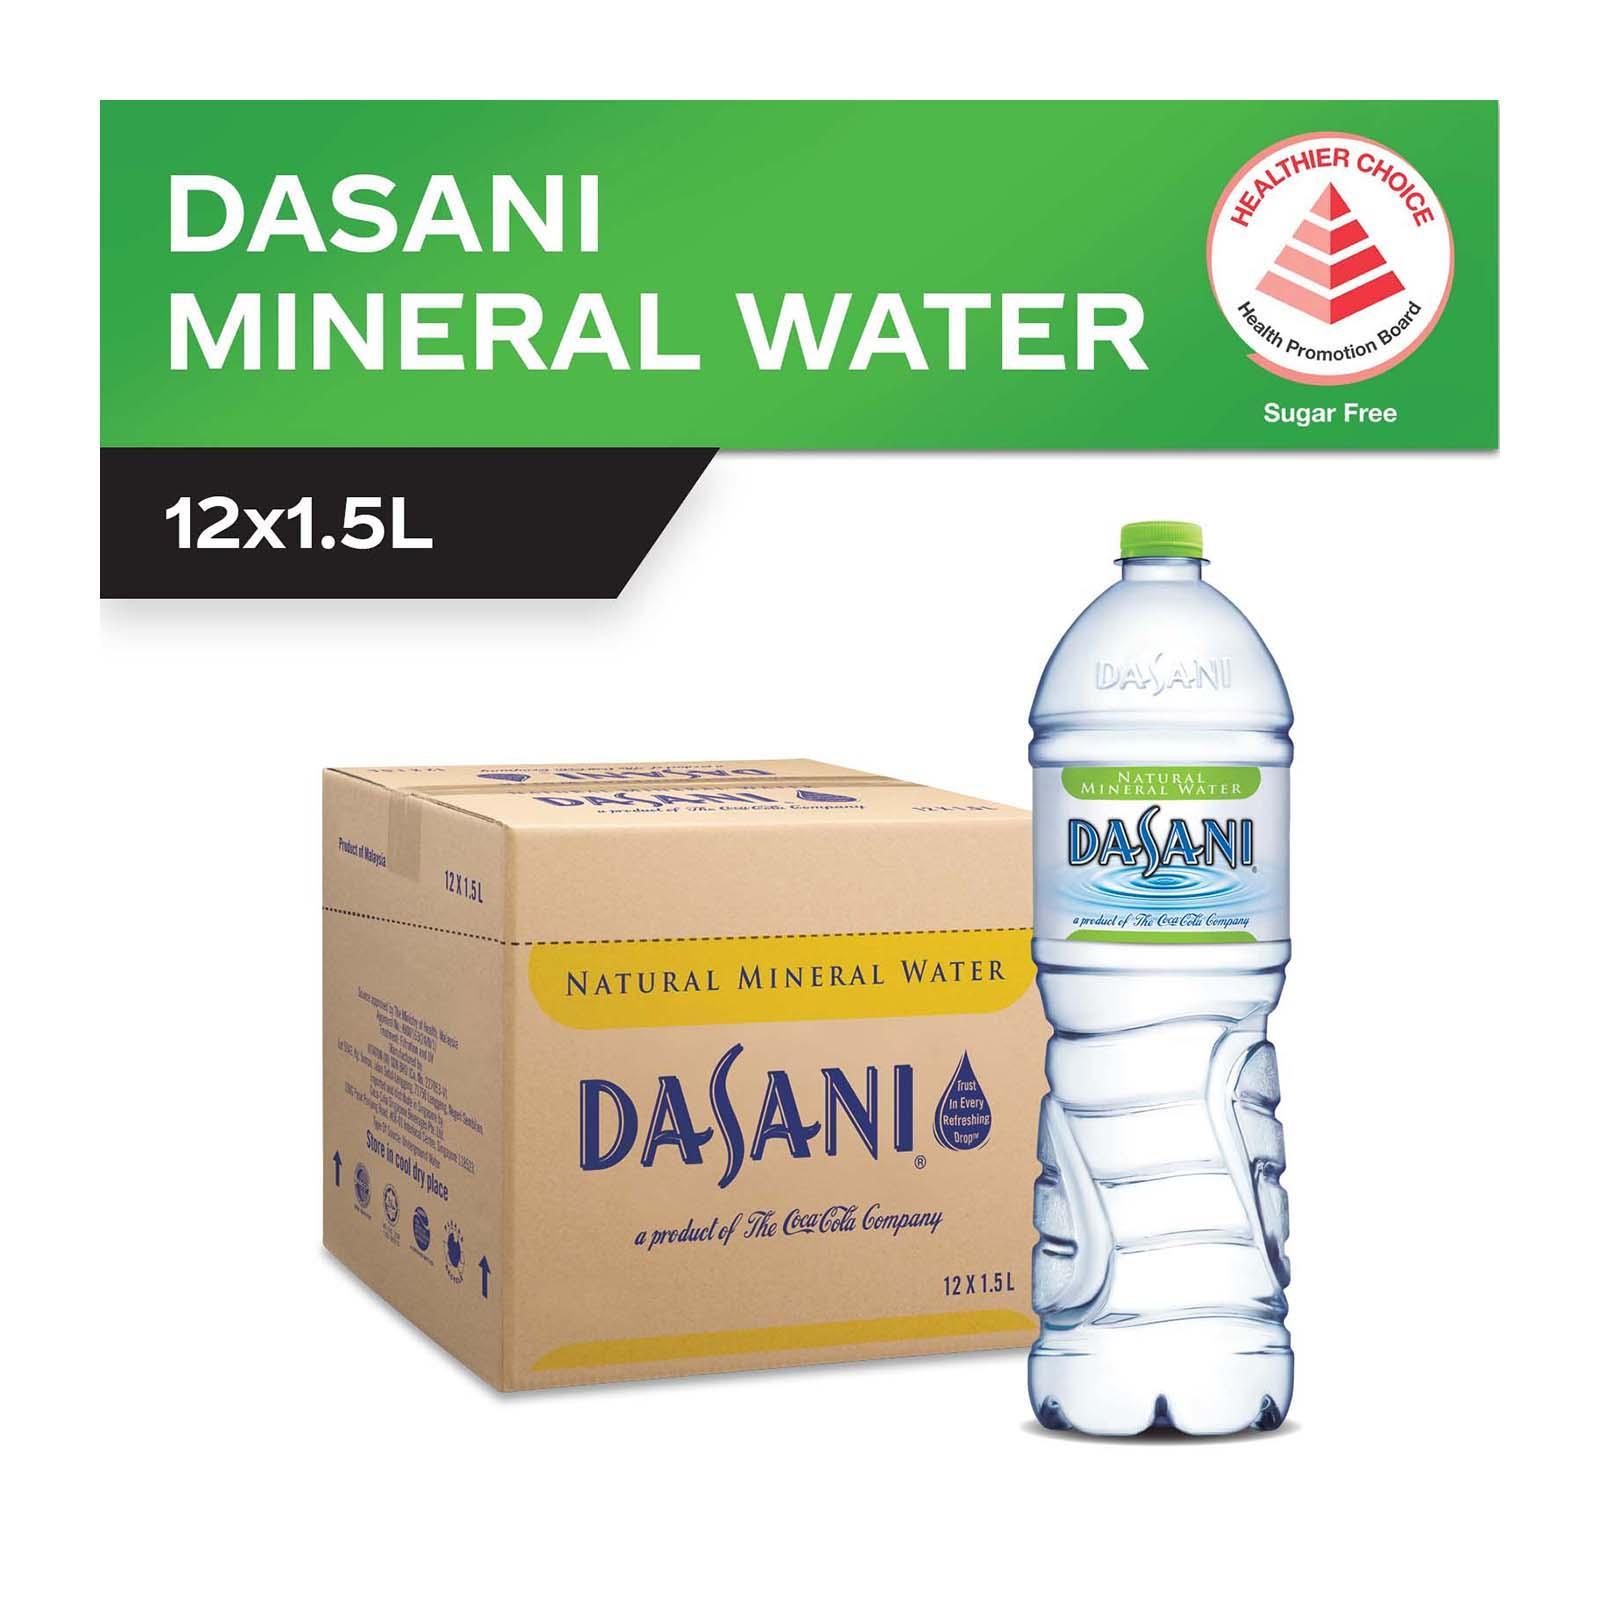 Dasani Mineral Water - Case